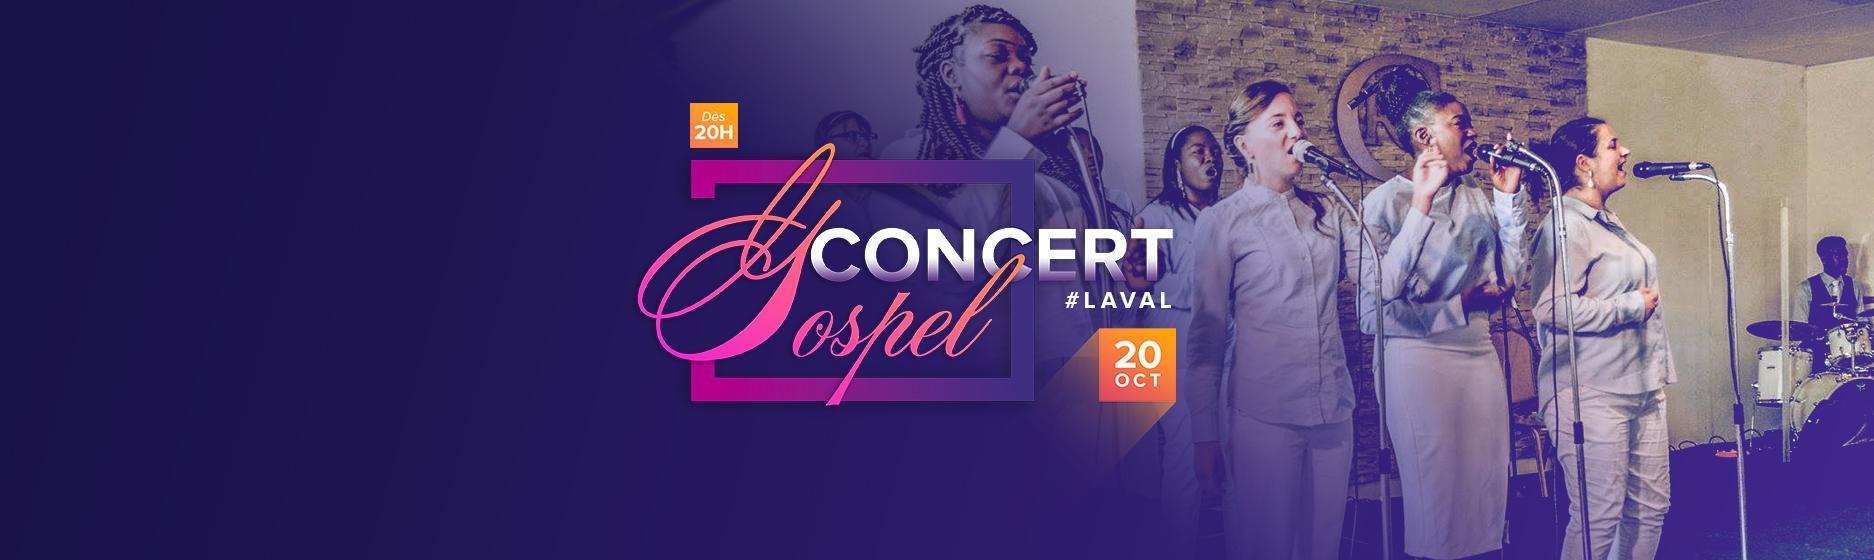 concert-gospel-laval